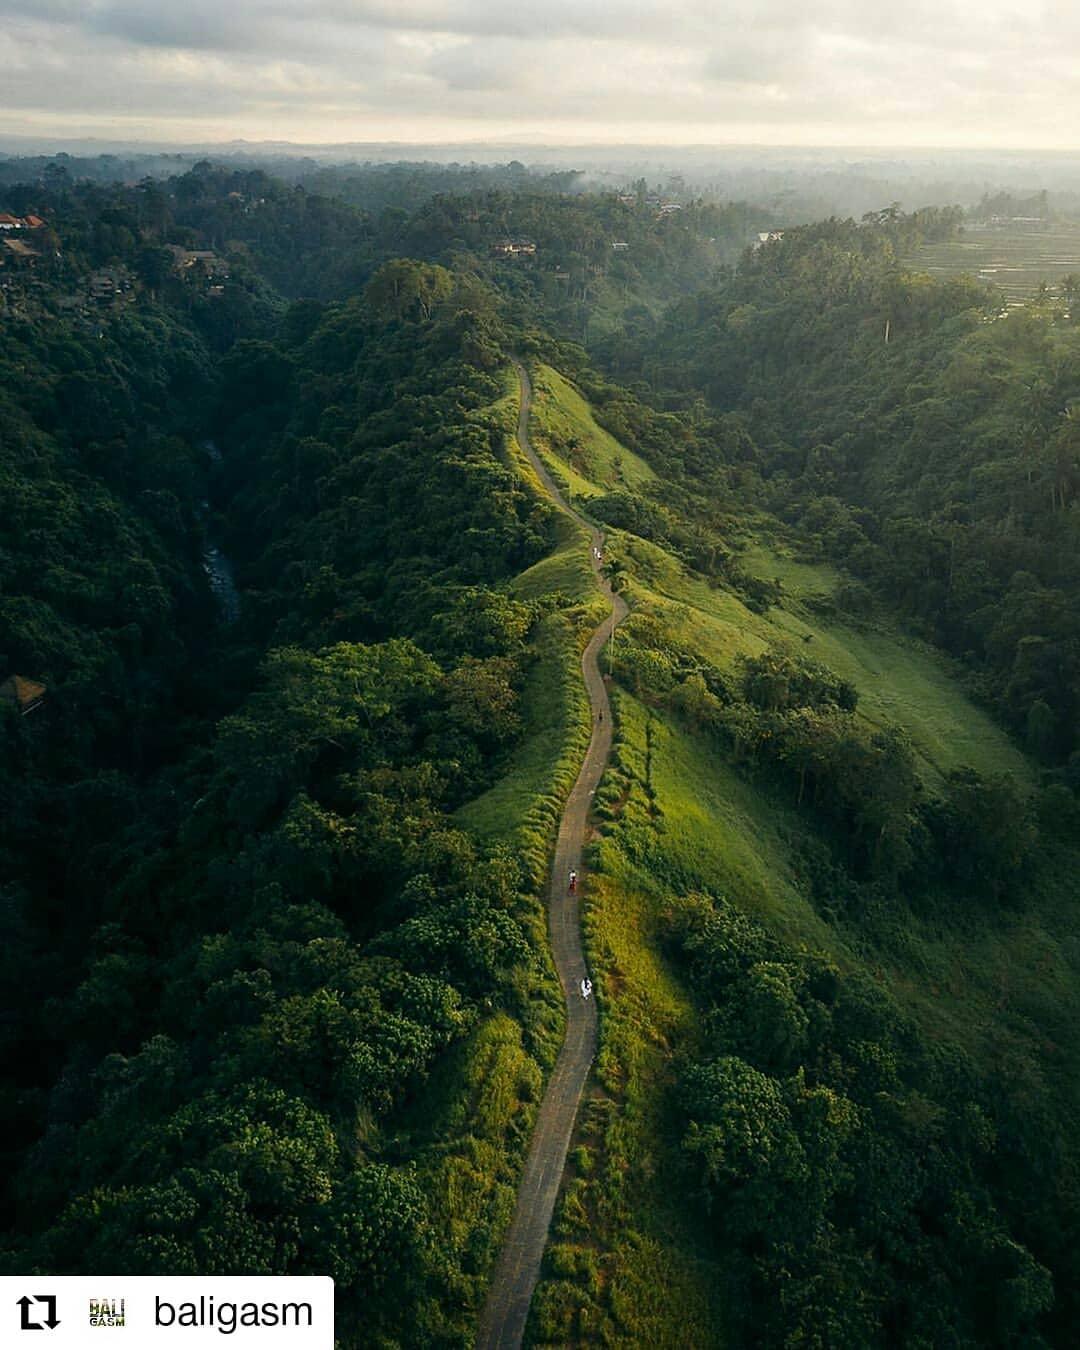 Wisata bukit Campuhan Ubud Bali - Dewata ID.jpg